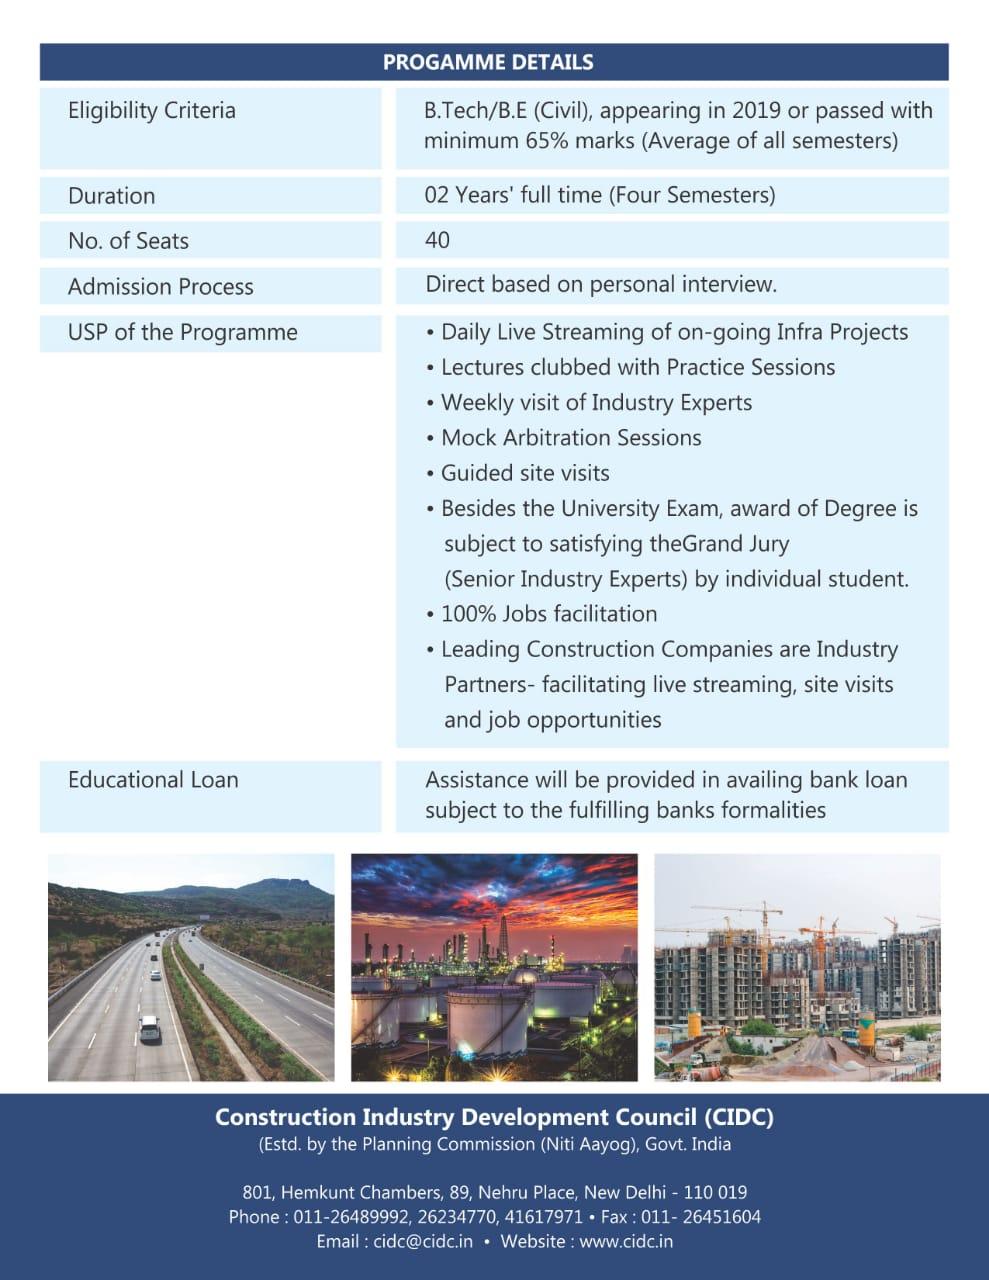 Construction Industry Development Council